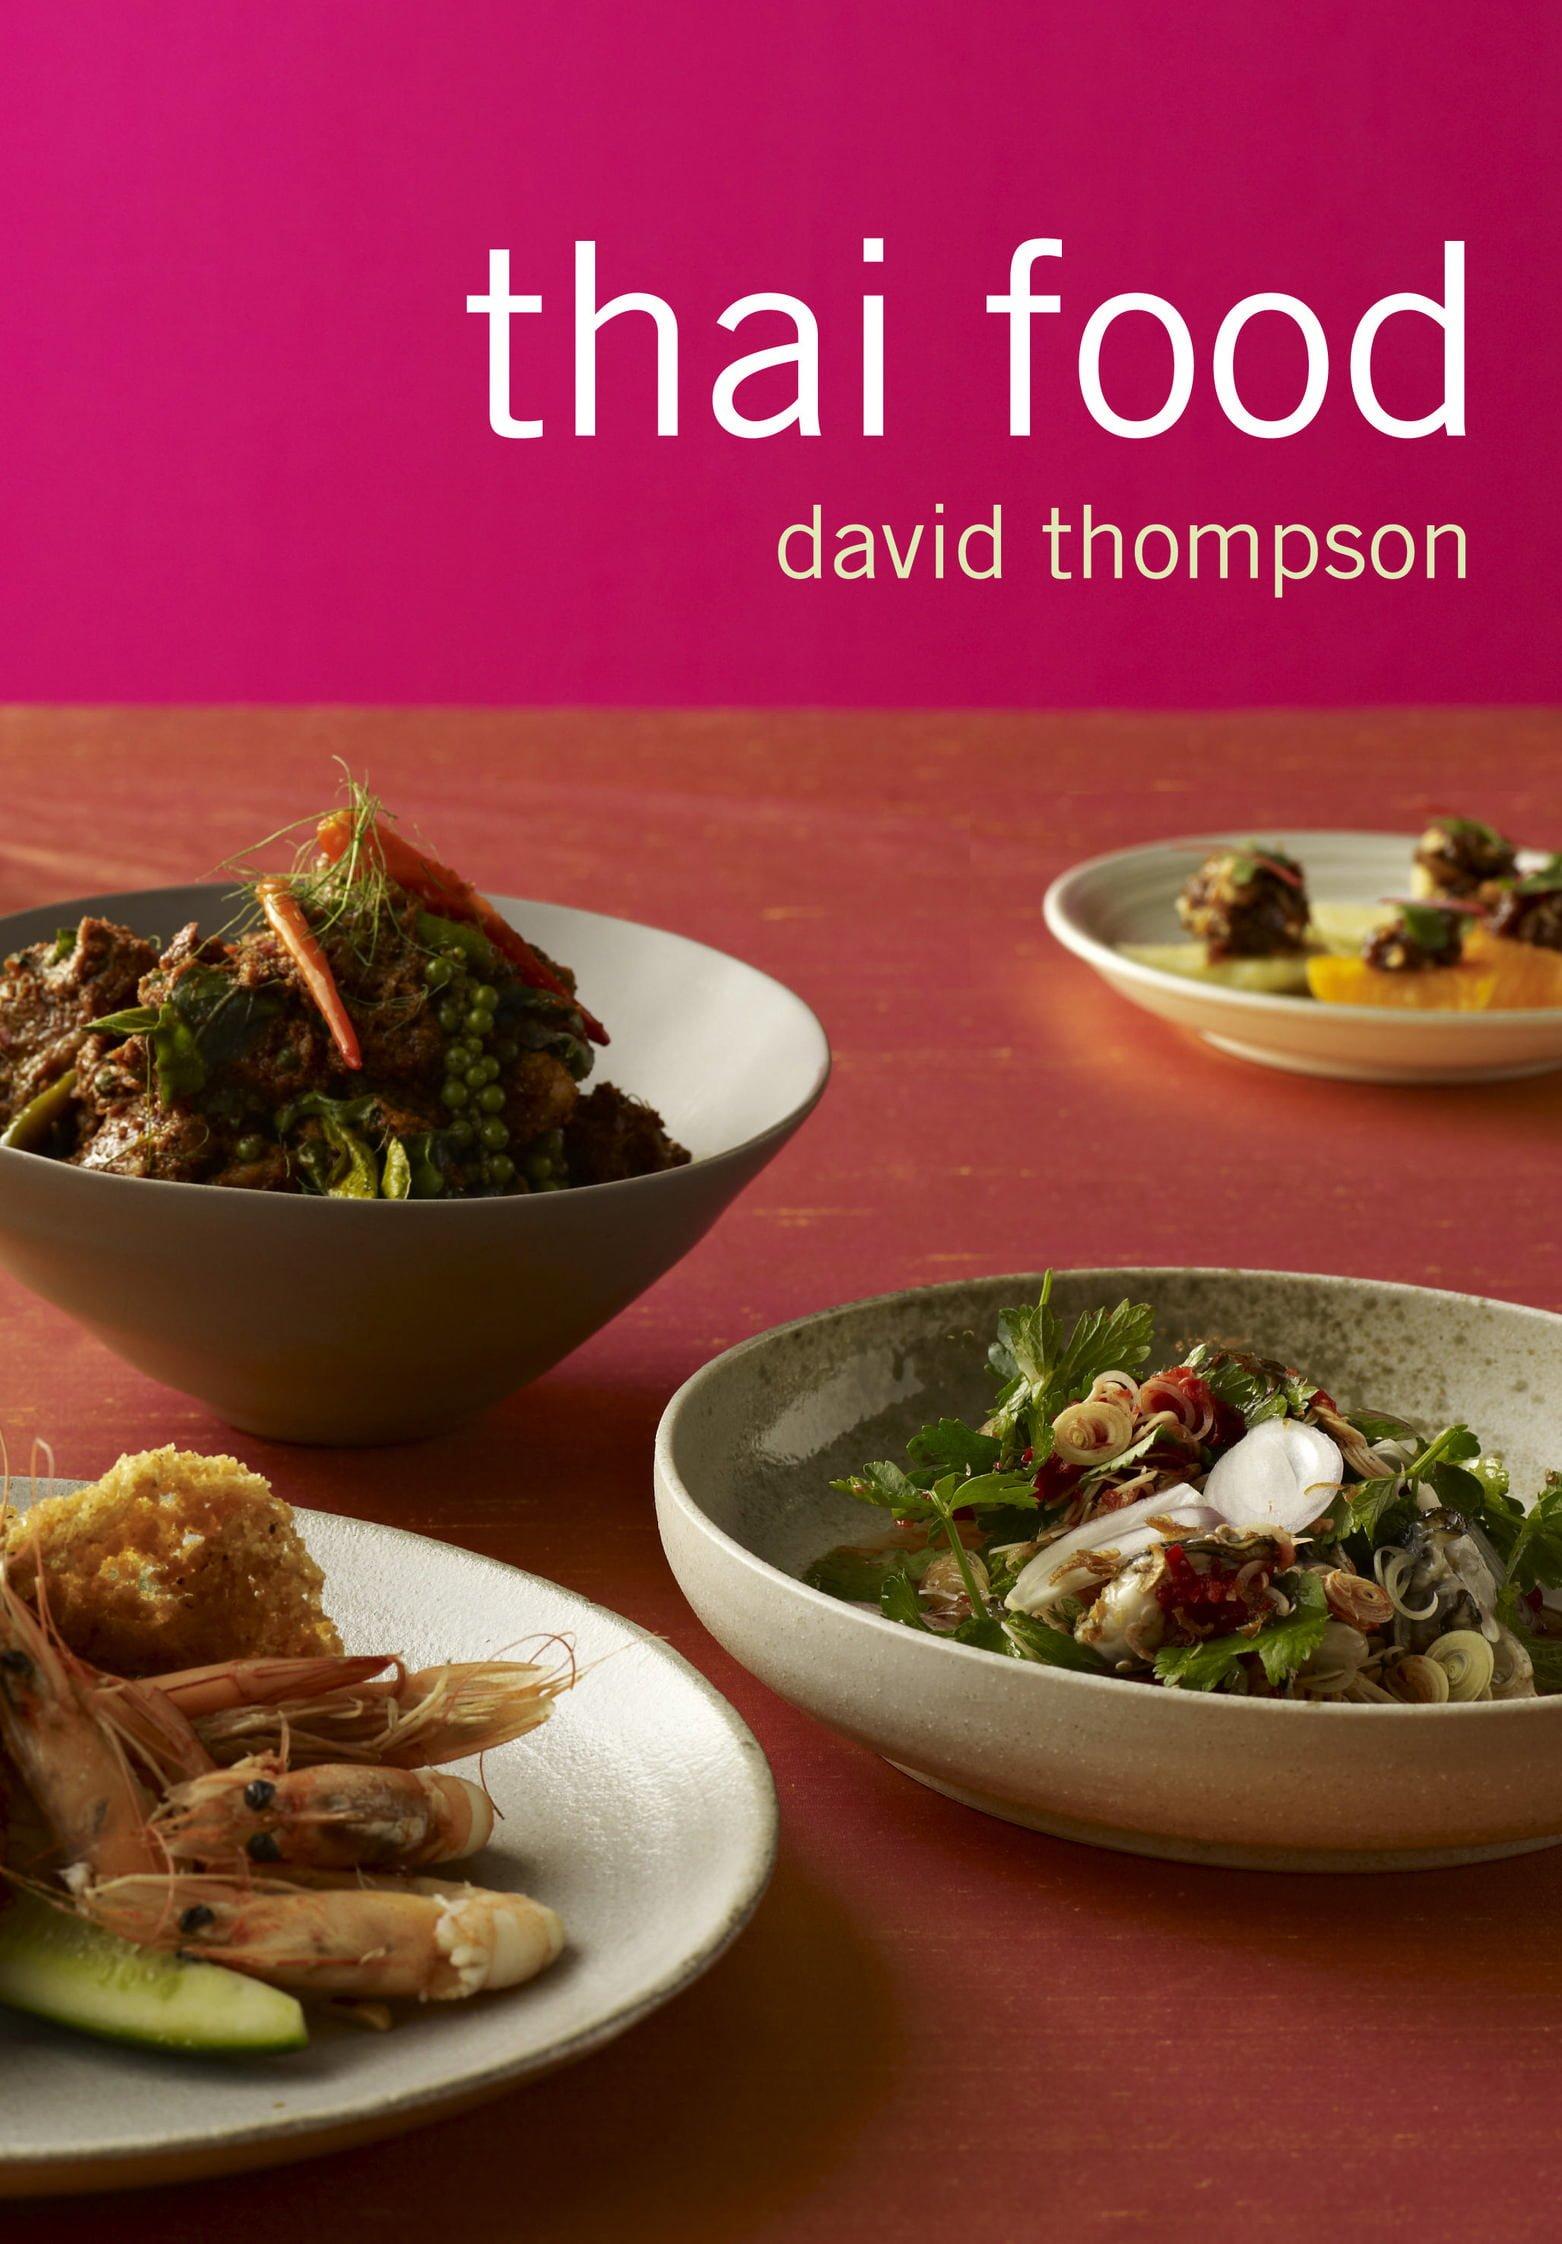 Thai food better reading thai food by david thompson description overview author bio author books forumfinder Choice Image